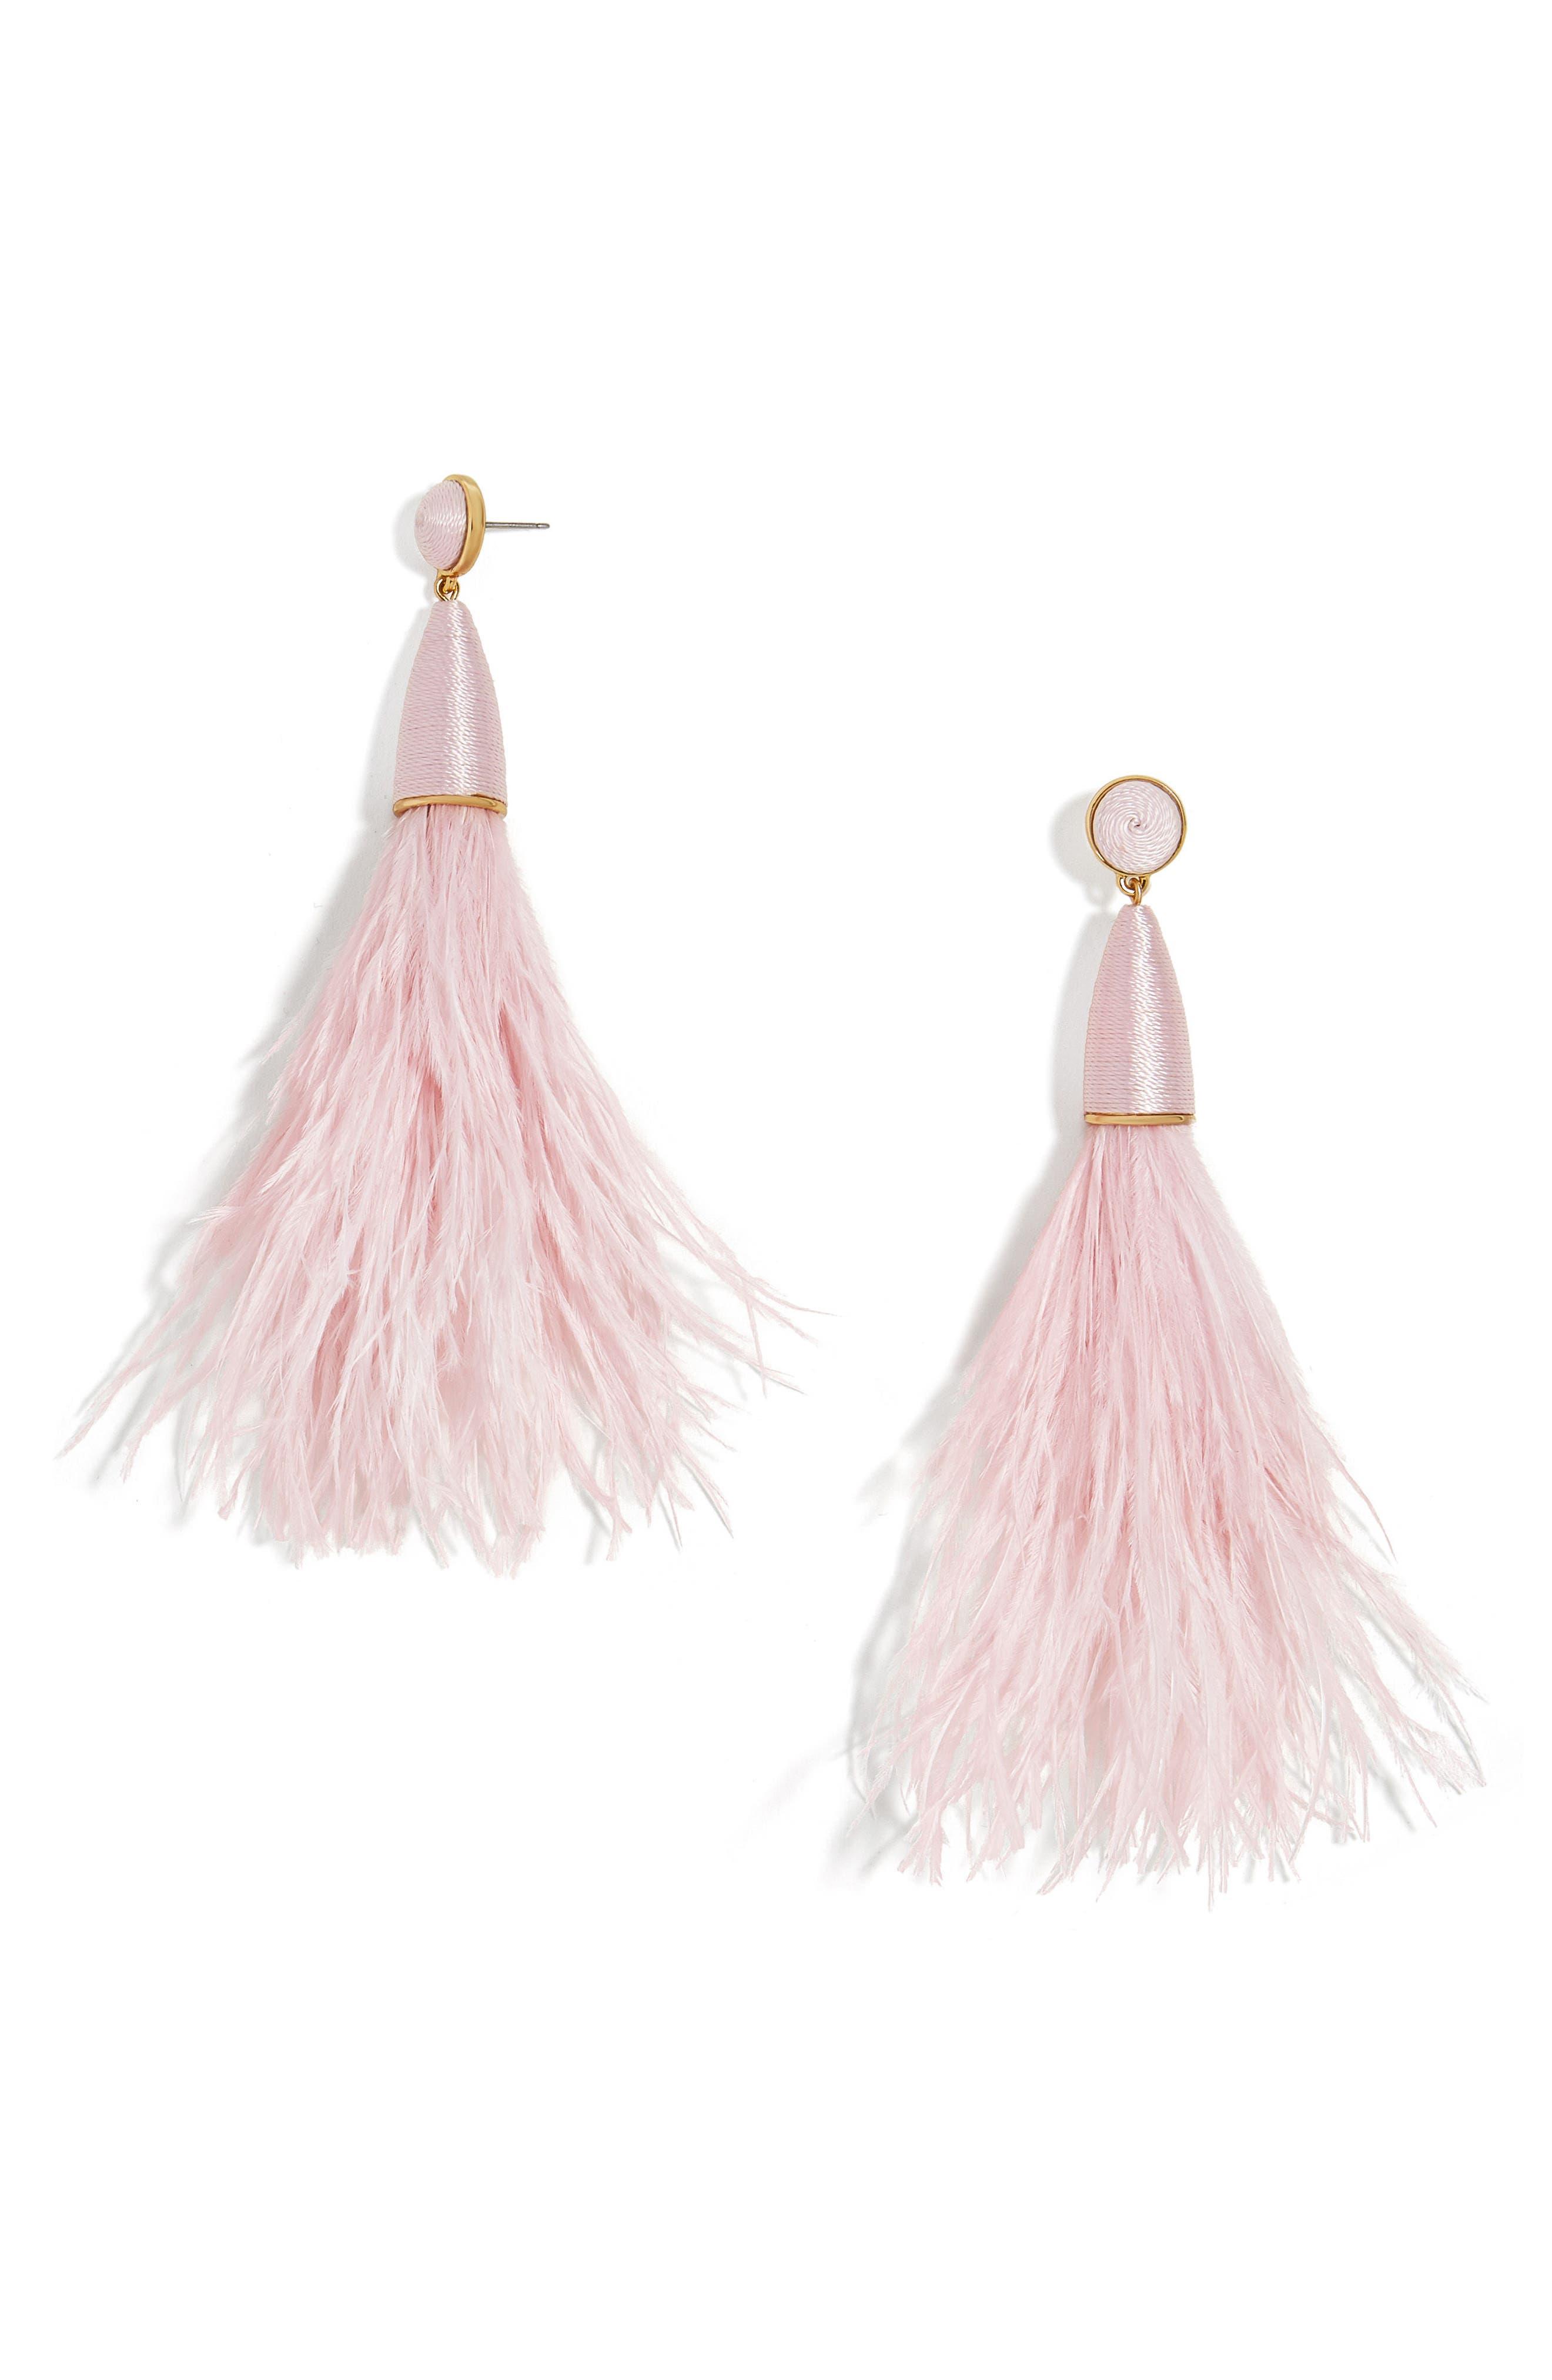 Chateau Feather Tassel Earrings,                             Main thumbnail 1, color,                             Blush